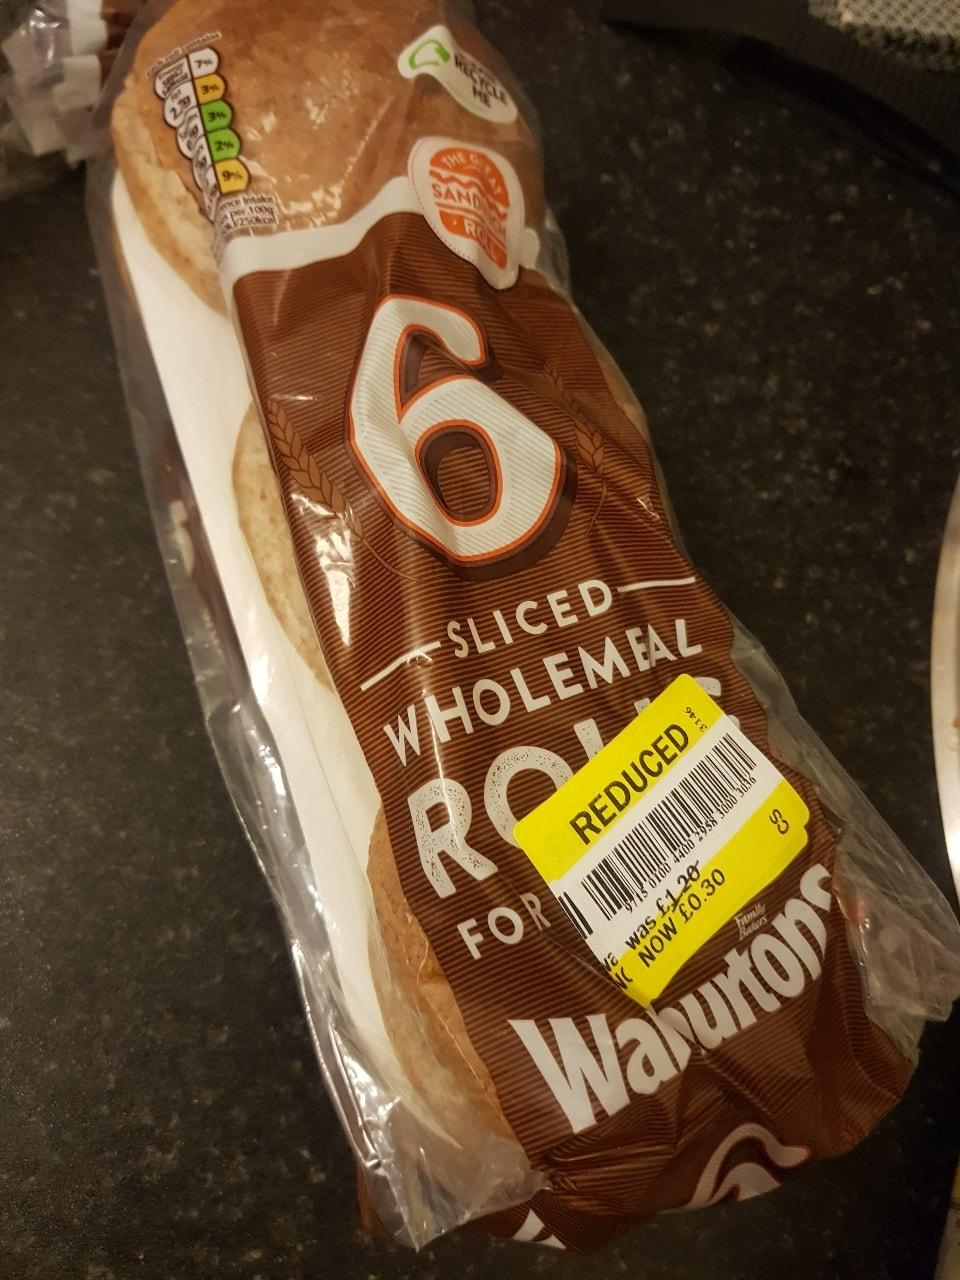 Sliced wholemeal rolls